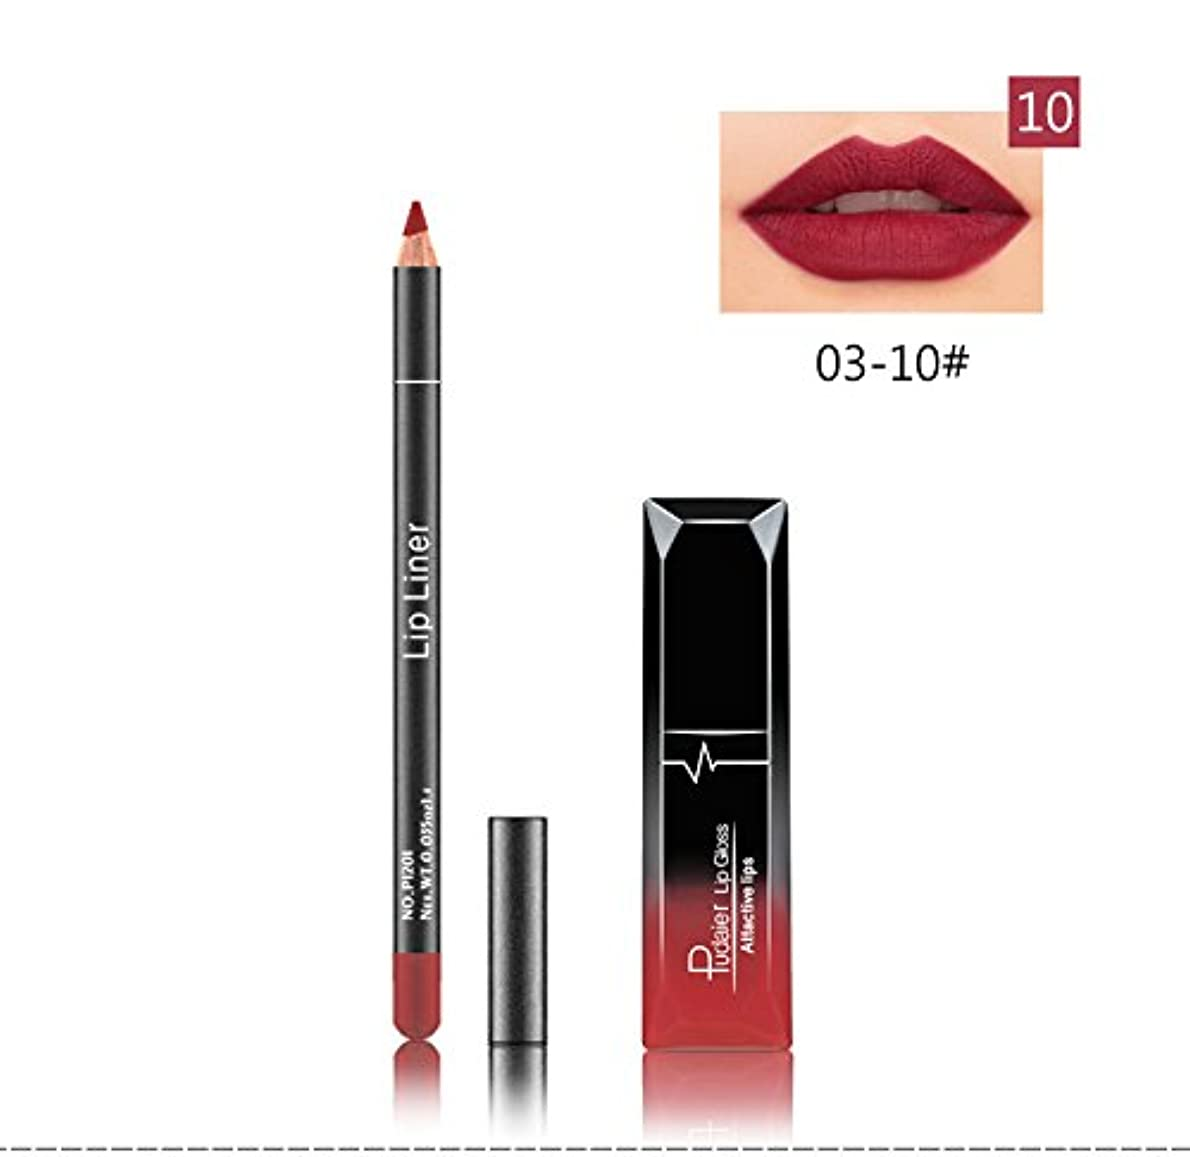 送金最大試用(10) Pudaier 1pc Matte Liquid Lipstick Cosmetic Lip Kit+ 1 Pc Nude Lip Liner Pencil MakeUp Set Waterproof Long...